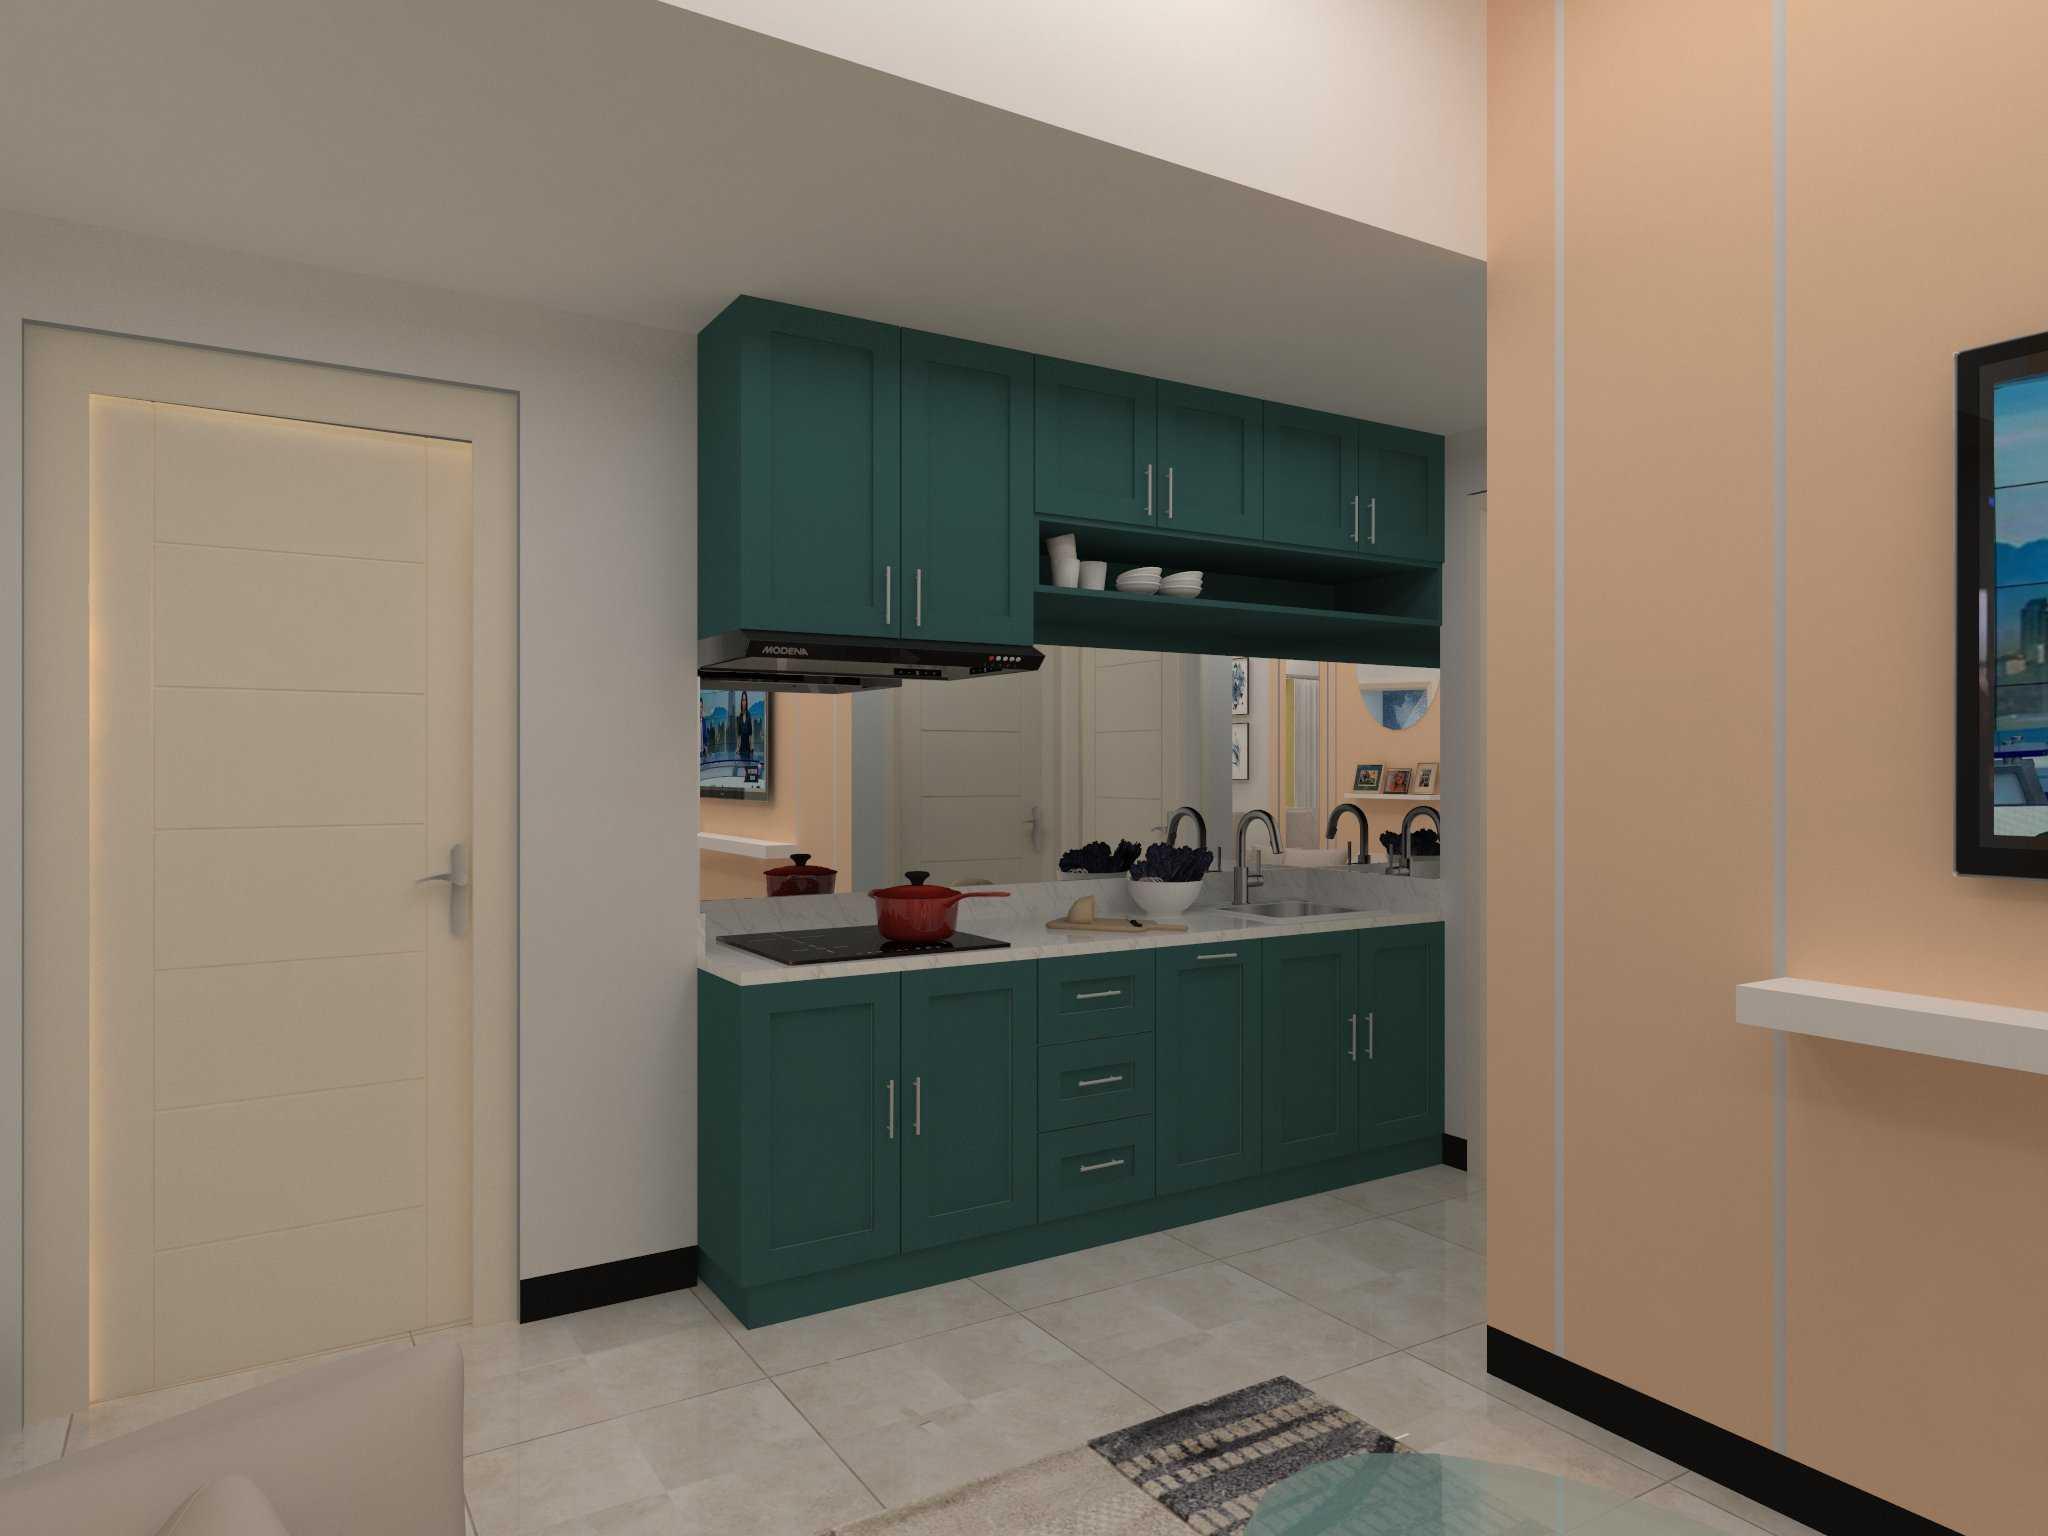 Efarsitek Studio Apartemen Benson Surabaya, Kota Sby, Jawa Timur, Indonesia Surabaya, Kota Sby, Jawa Timur, Indonesia Efarsitek-Studio-Apartemen-Benson   130440